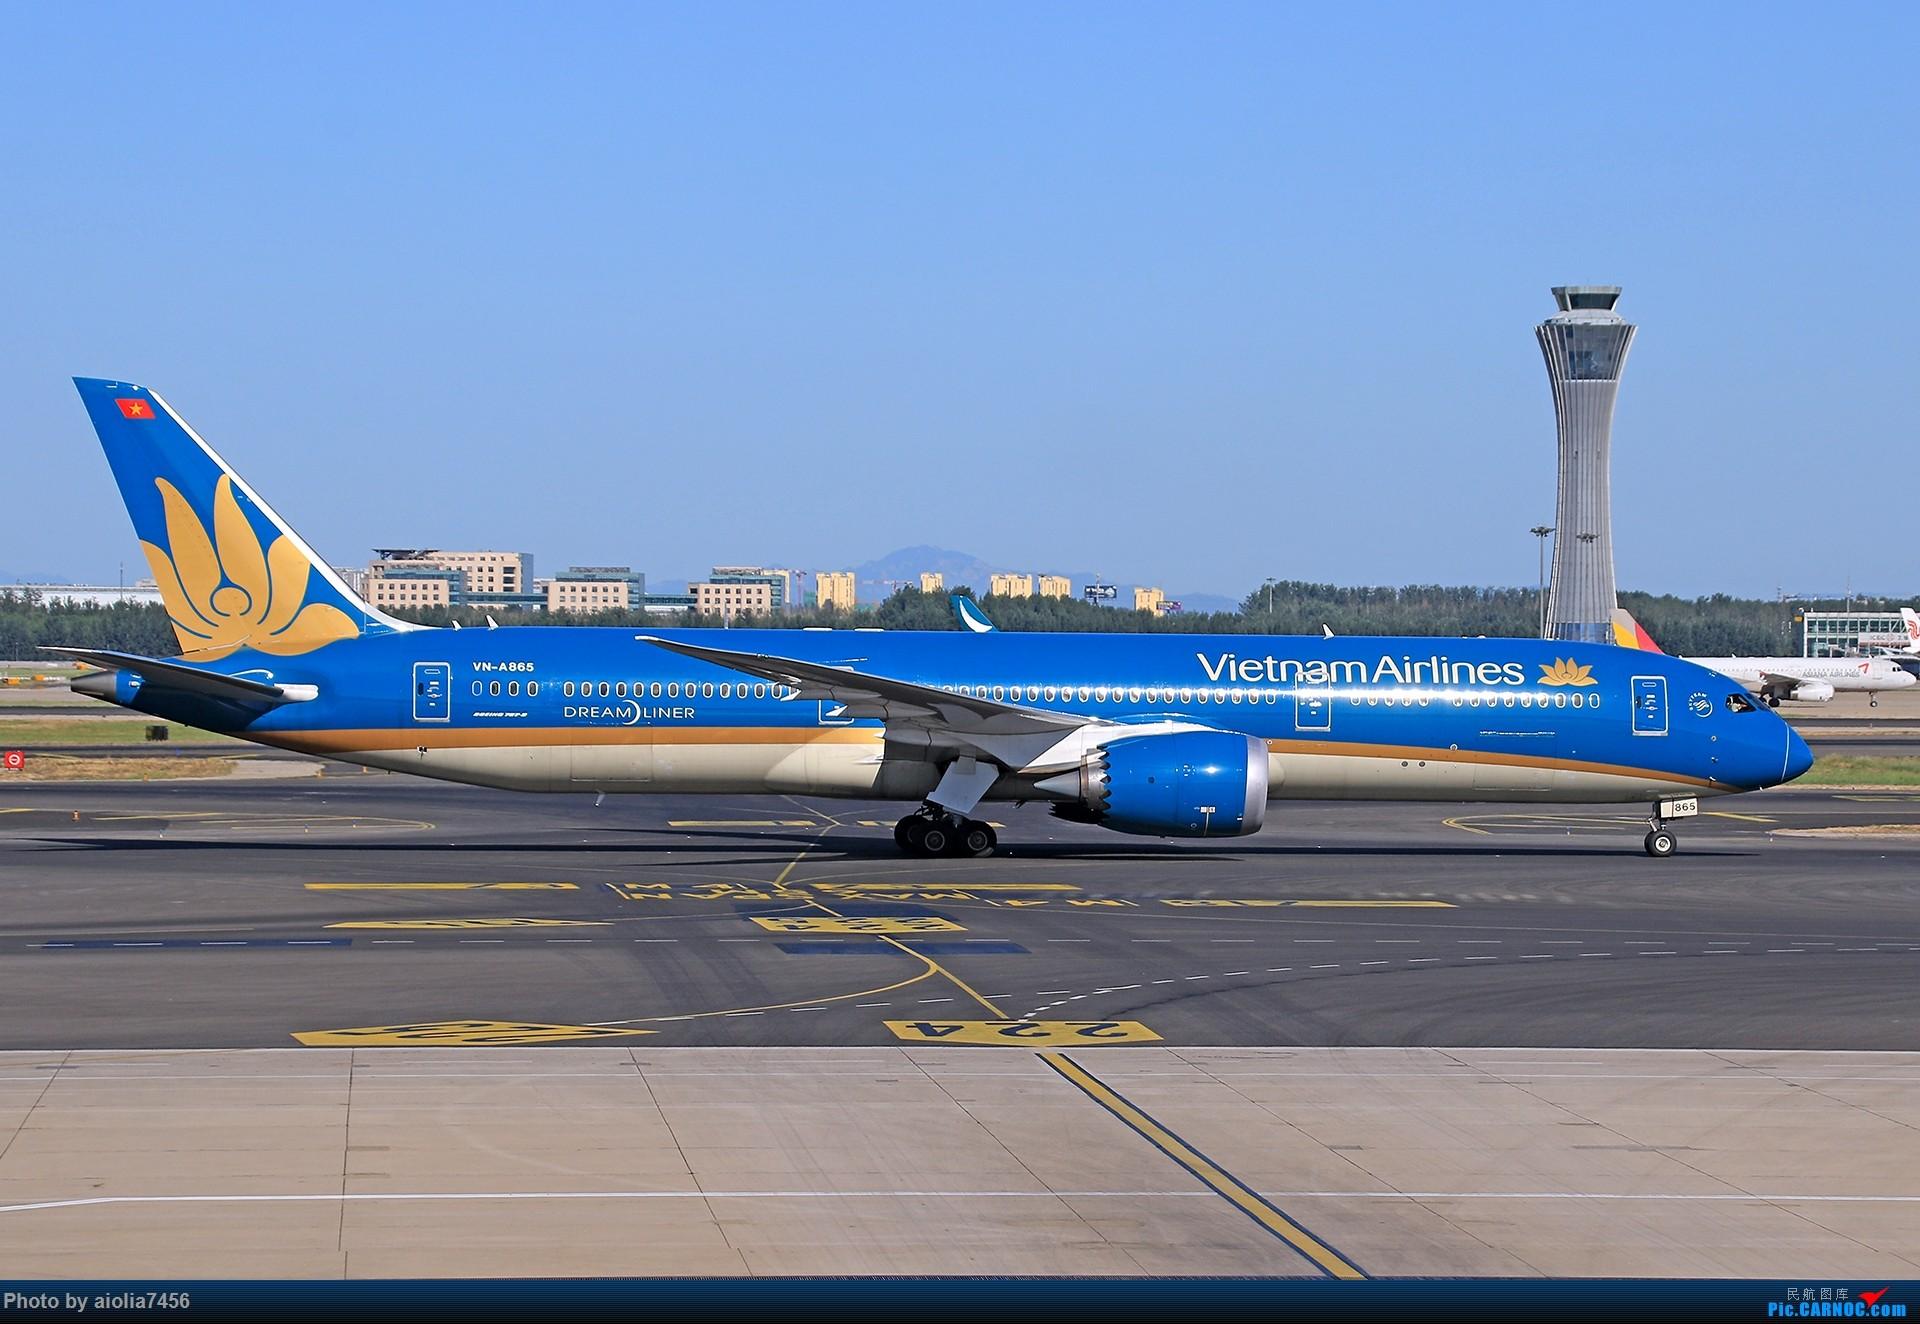 Re:[原创]合肥飞友会[霸都飞友会]冷风过境,吹回了久违的蓝天,而我刚刚好路过PEK BOEING 787-9 VN-A865 中国北京首都国际机场